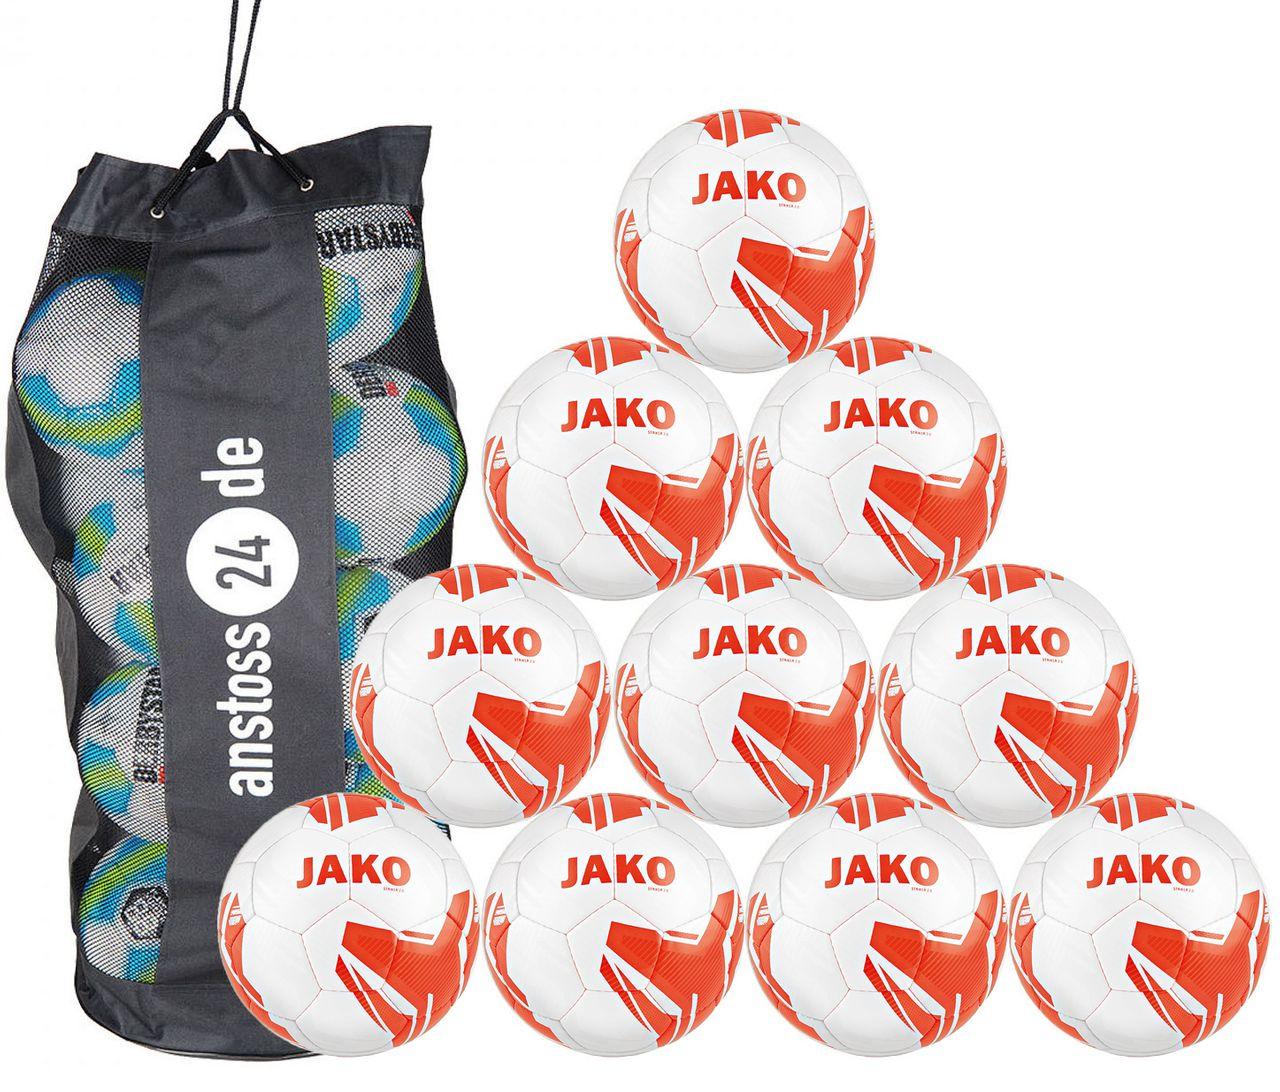 10 x JAKO Jugendball Striker 2.0 MS inkl. Ballsack